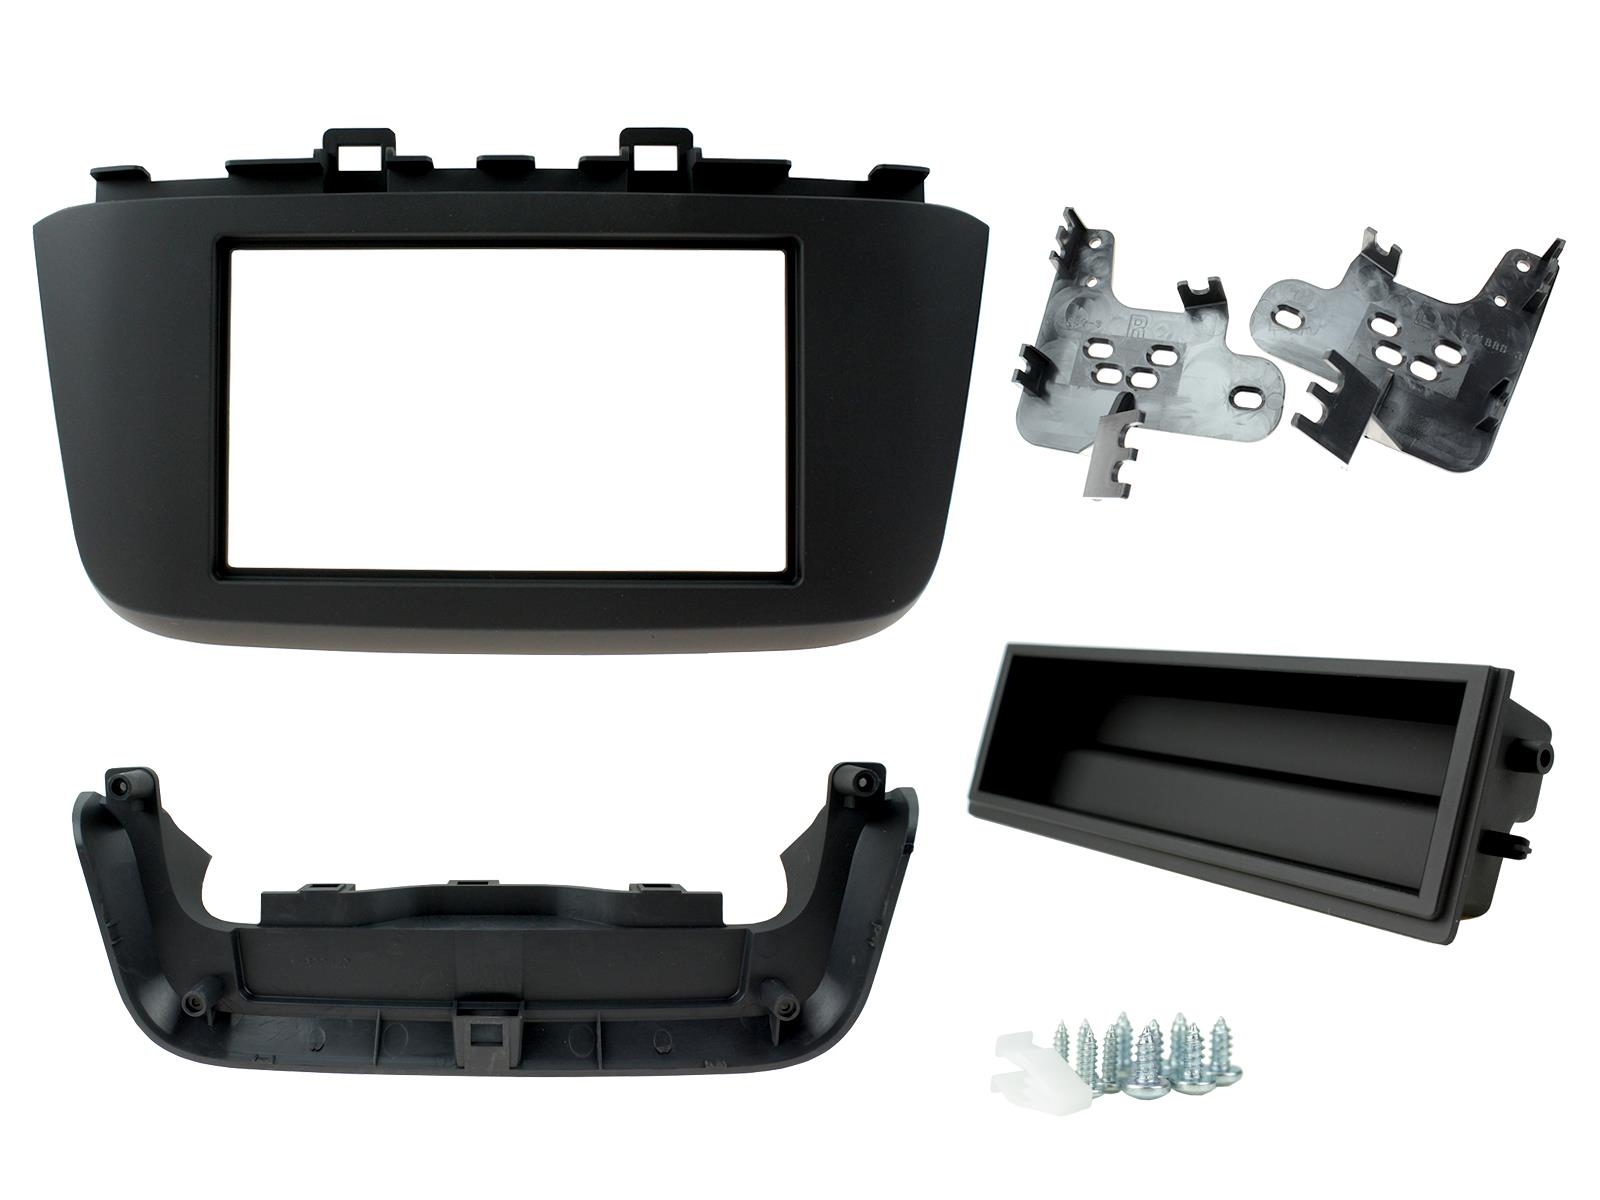 2-DIN frame met bakje iso Hyundai Kona 2018 - Zwart